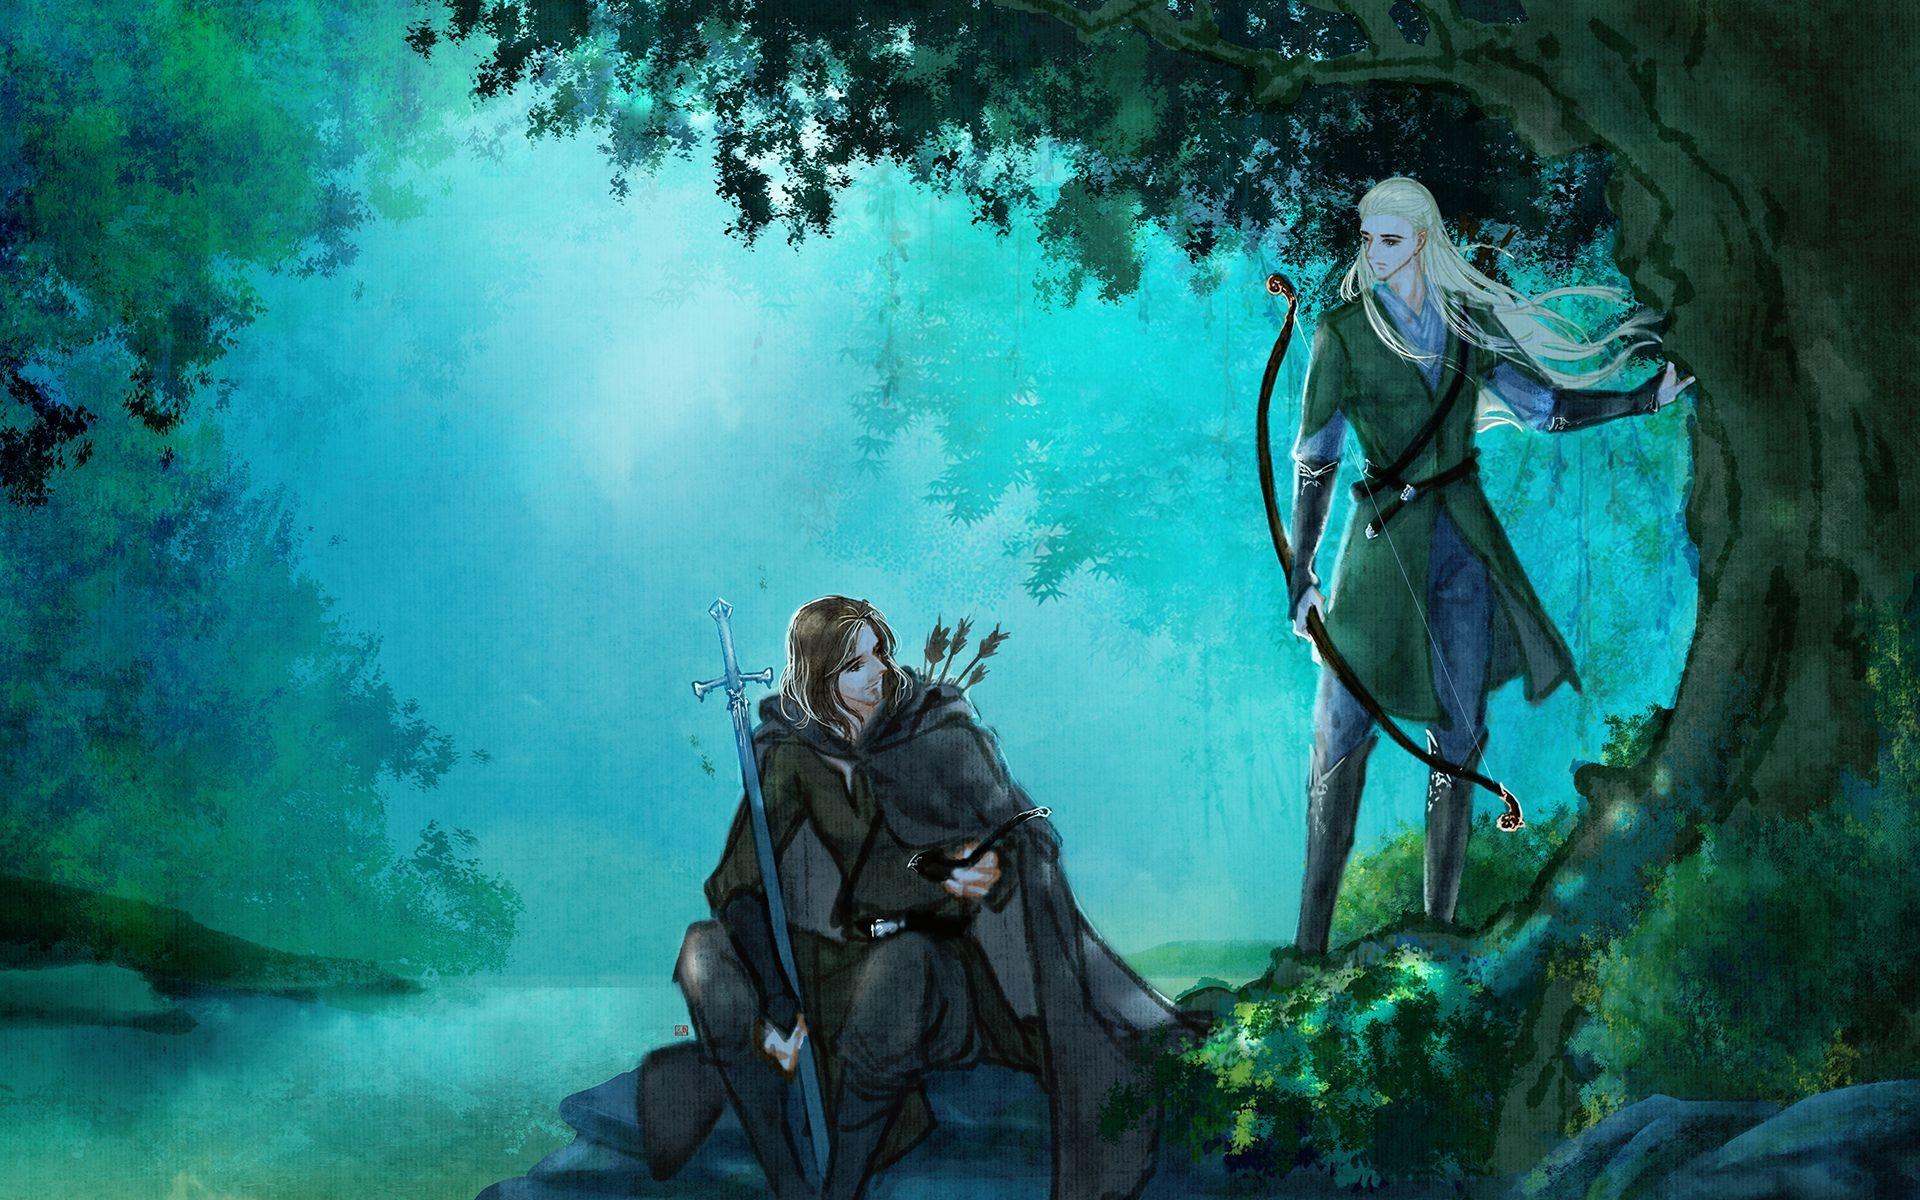 Legolas free background